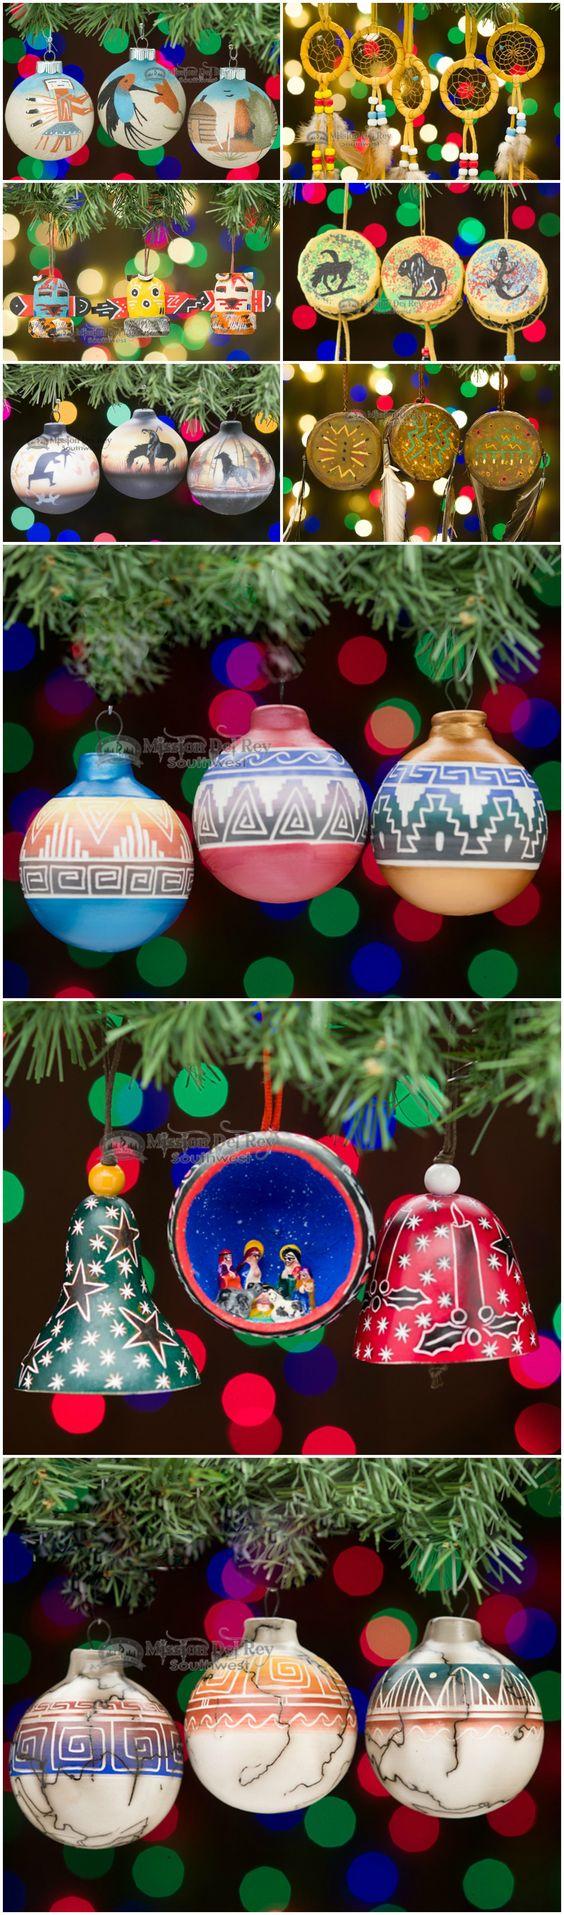 Pin by Lori Rowe on Southwestern Christmas